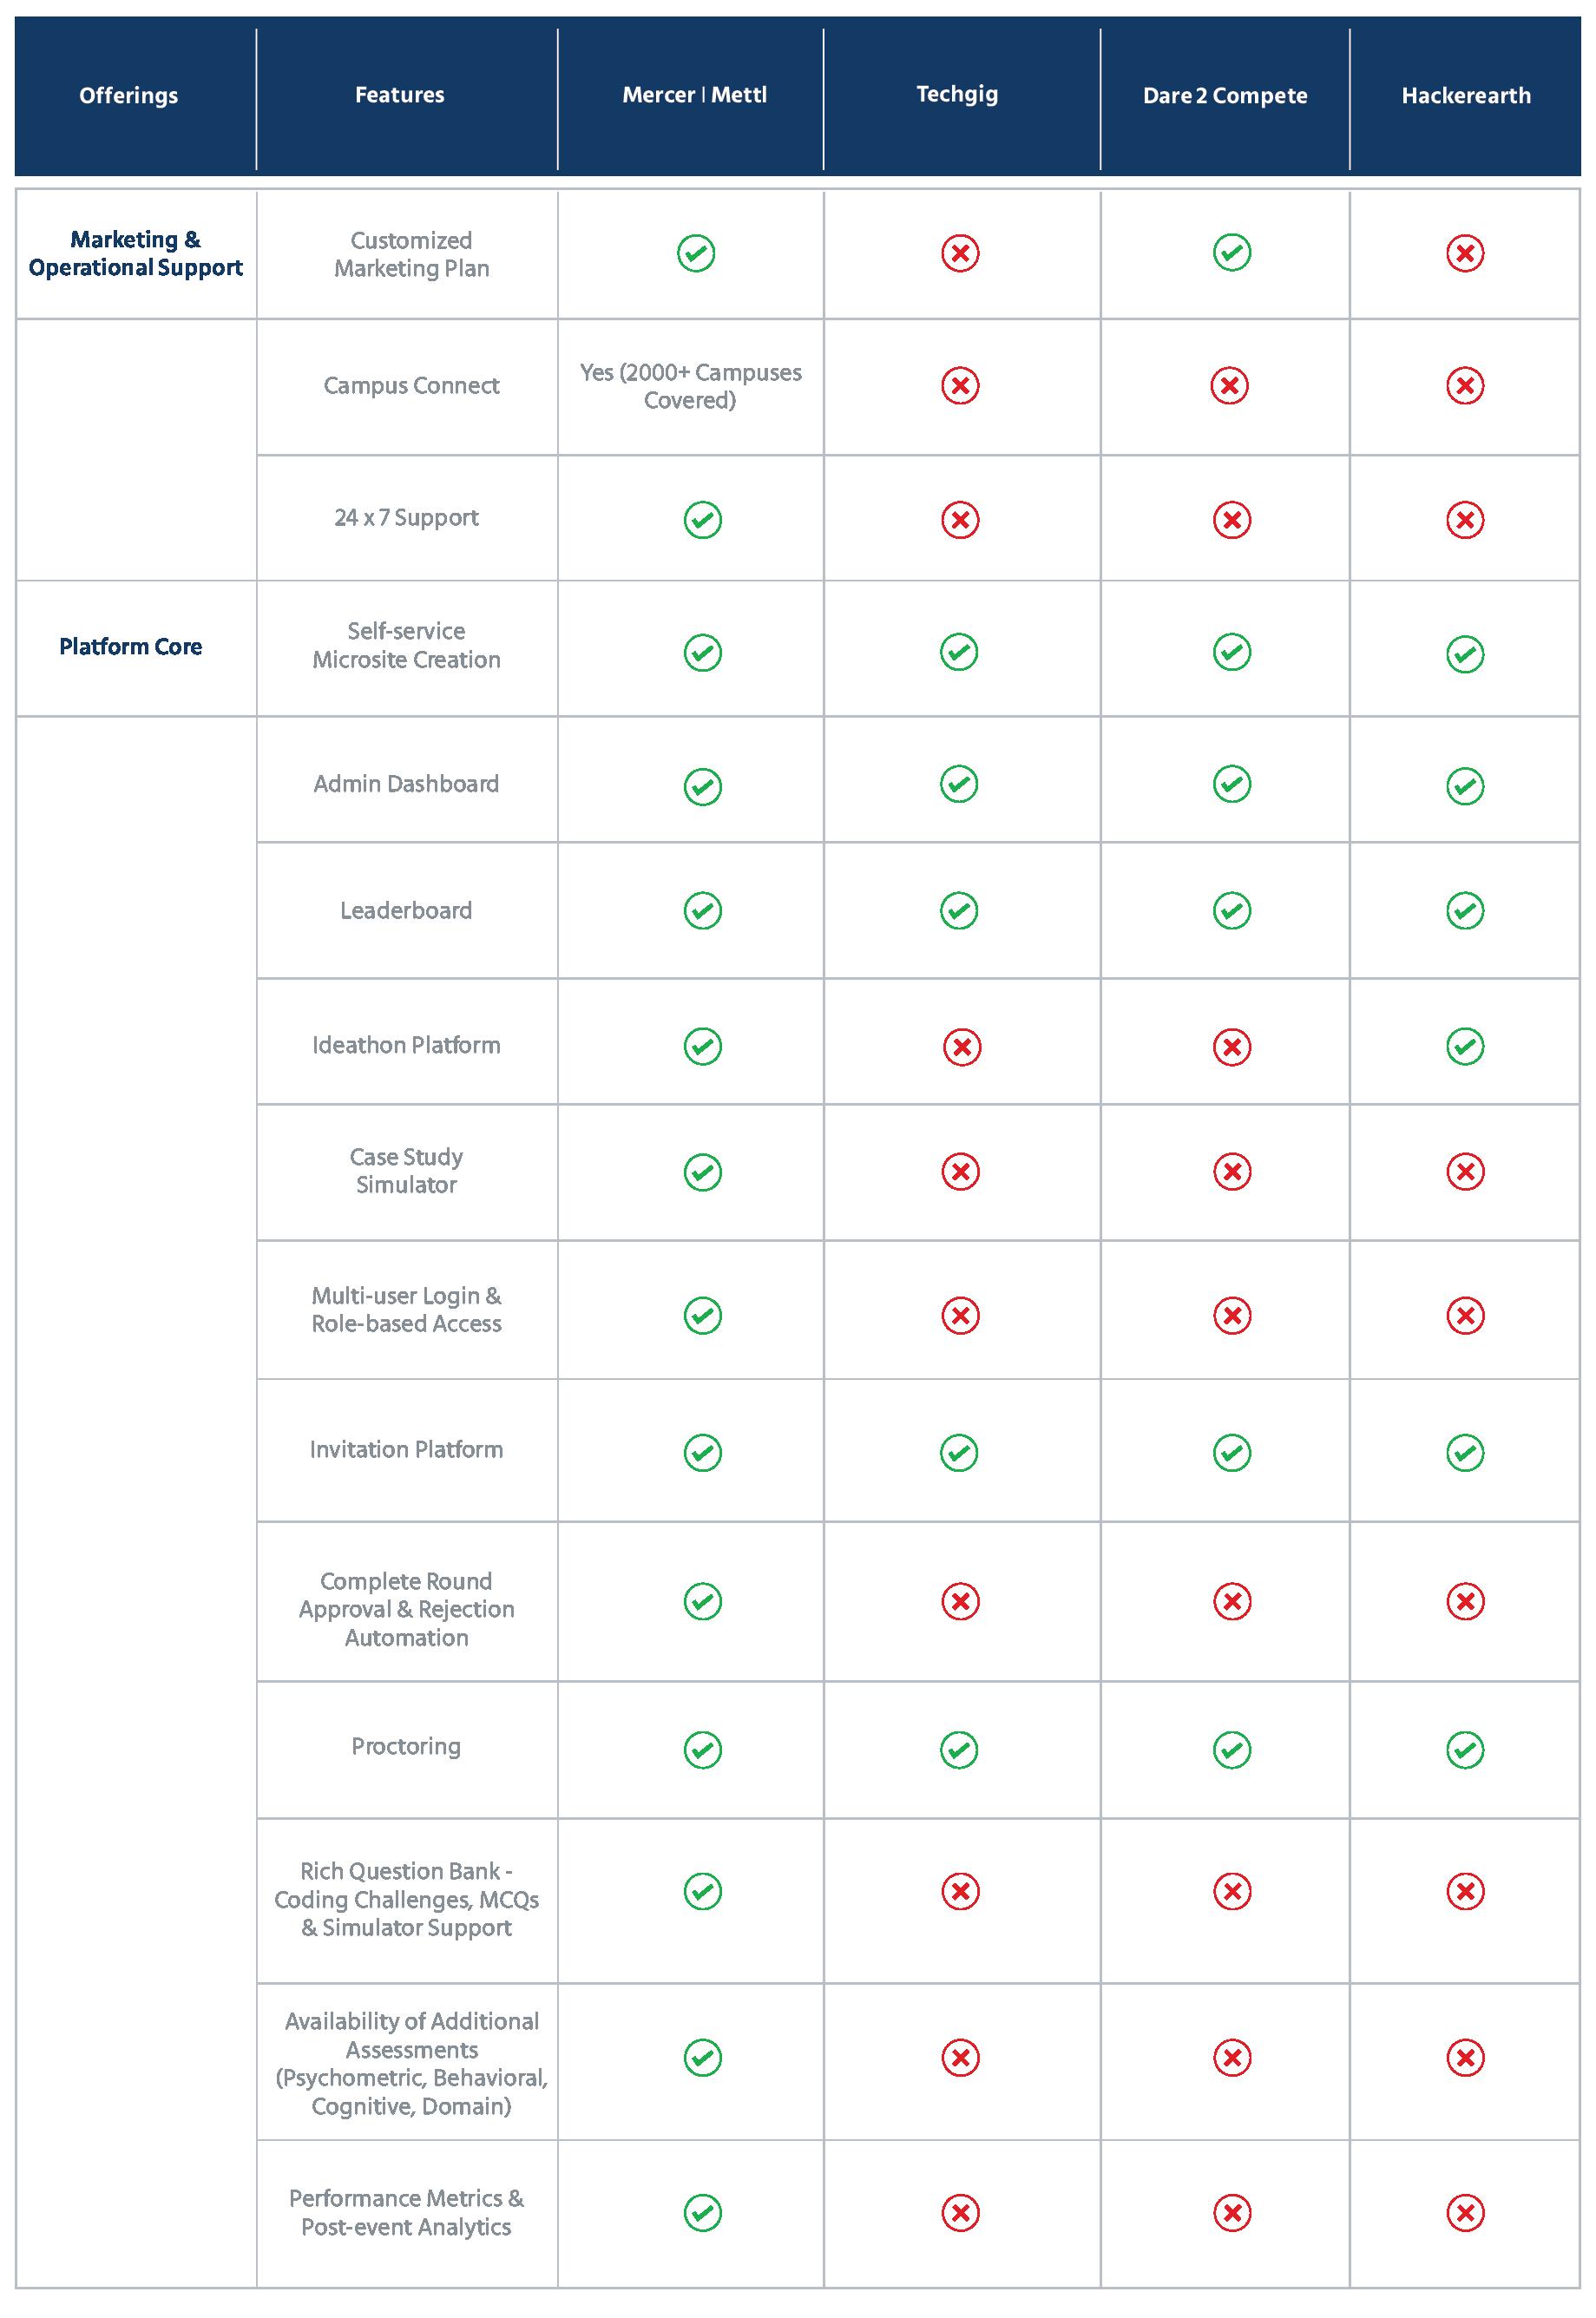 Top Hackathon Platform Providers